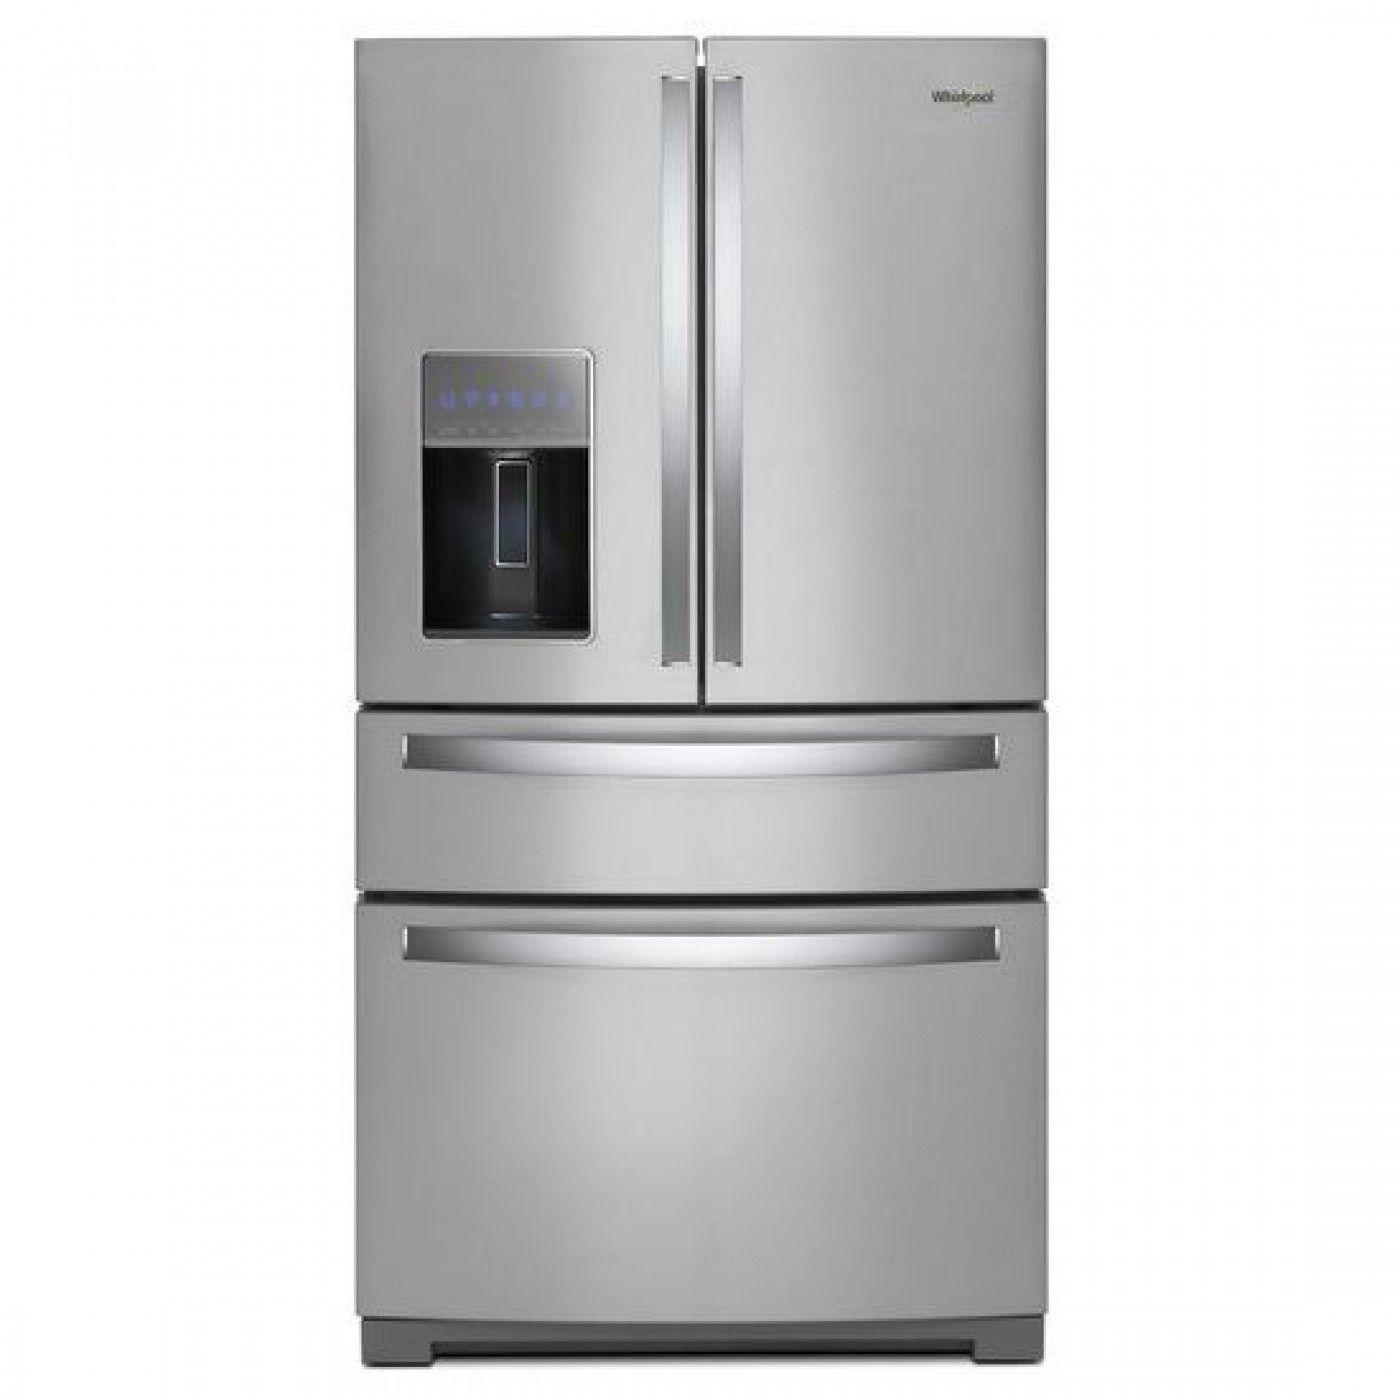 Wrx986sihz By Whirlpool French Door Refrigerators Goedekers